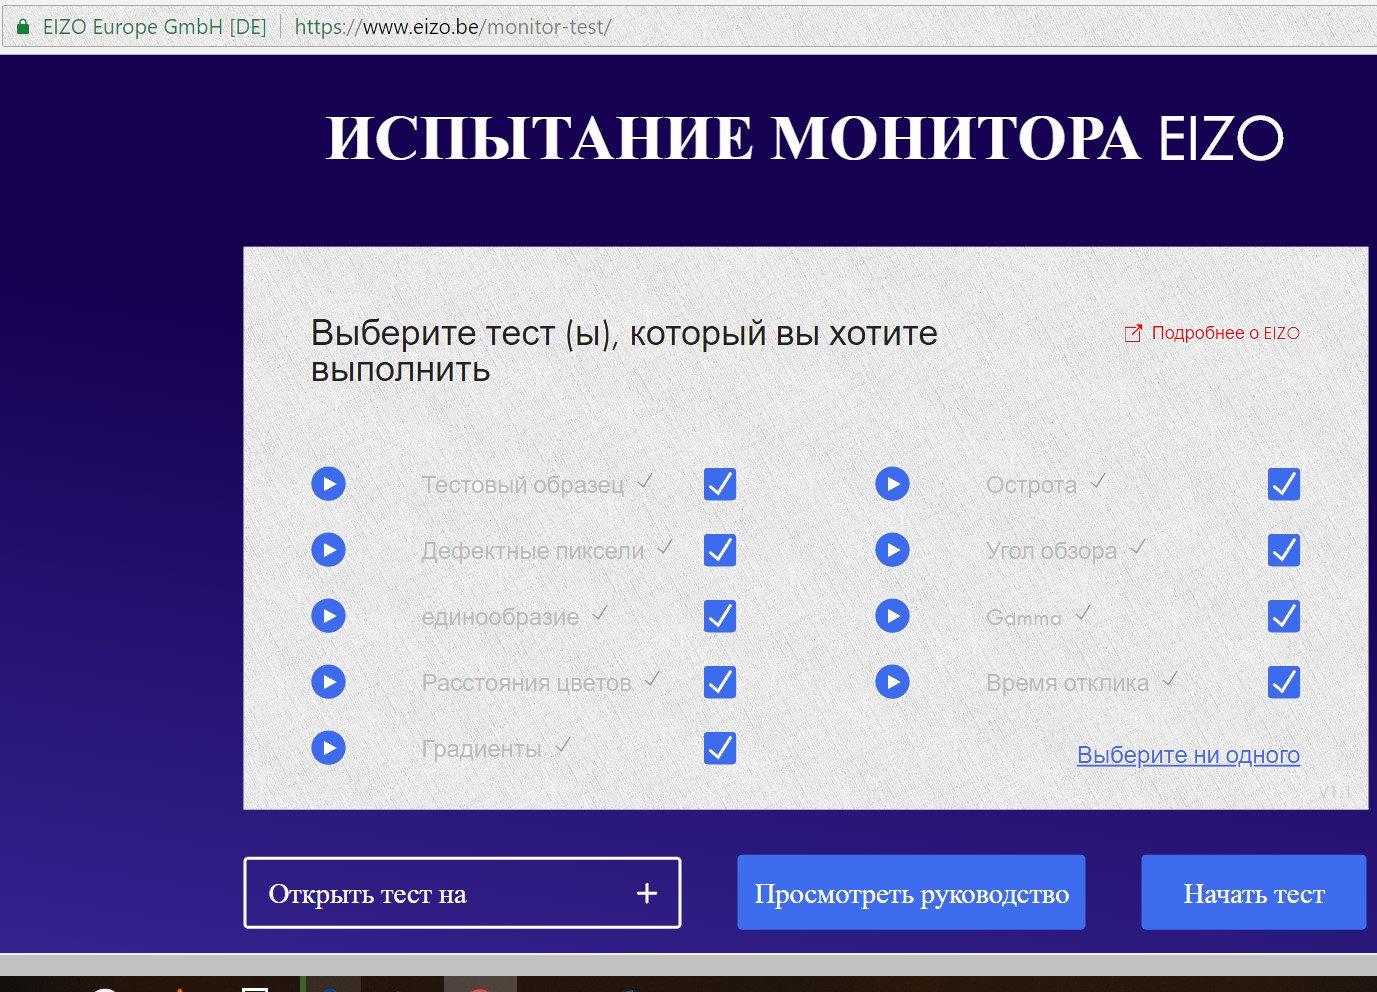 eizo monitortest проверка с сайта